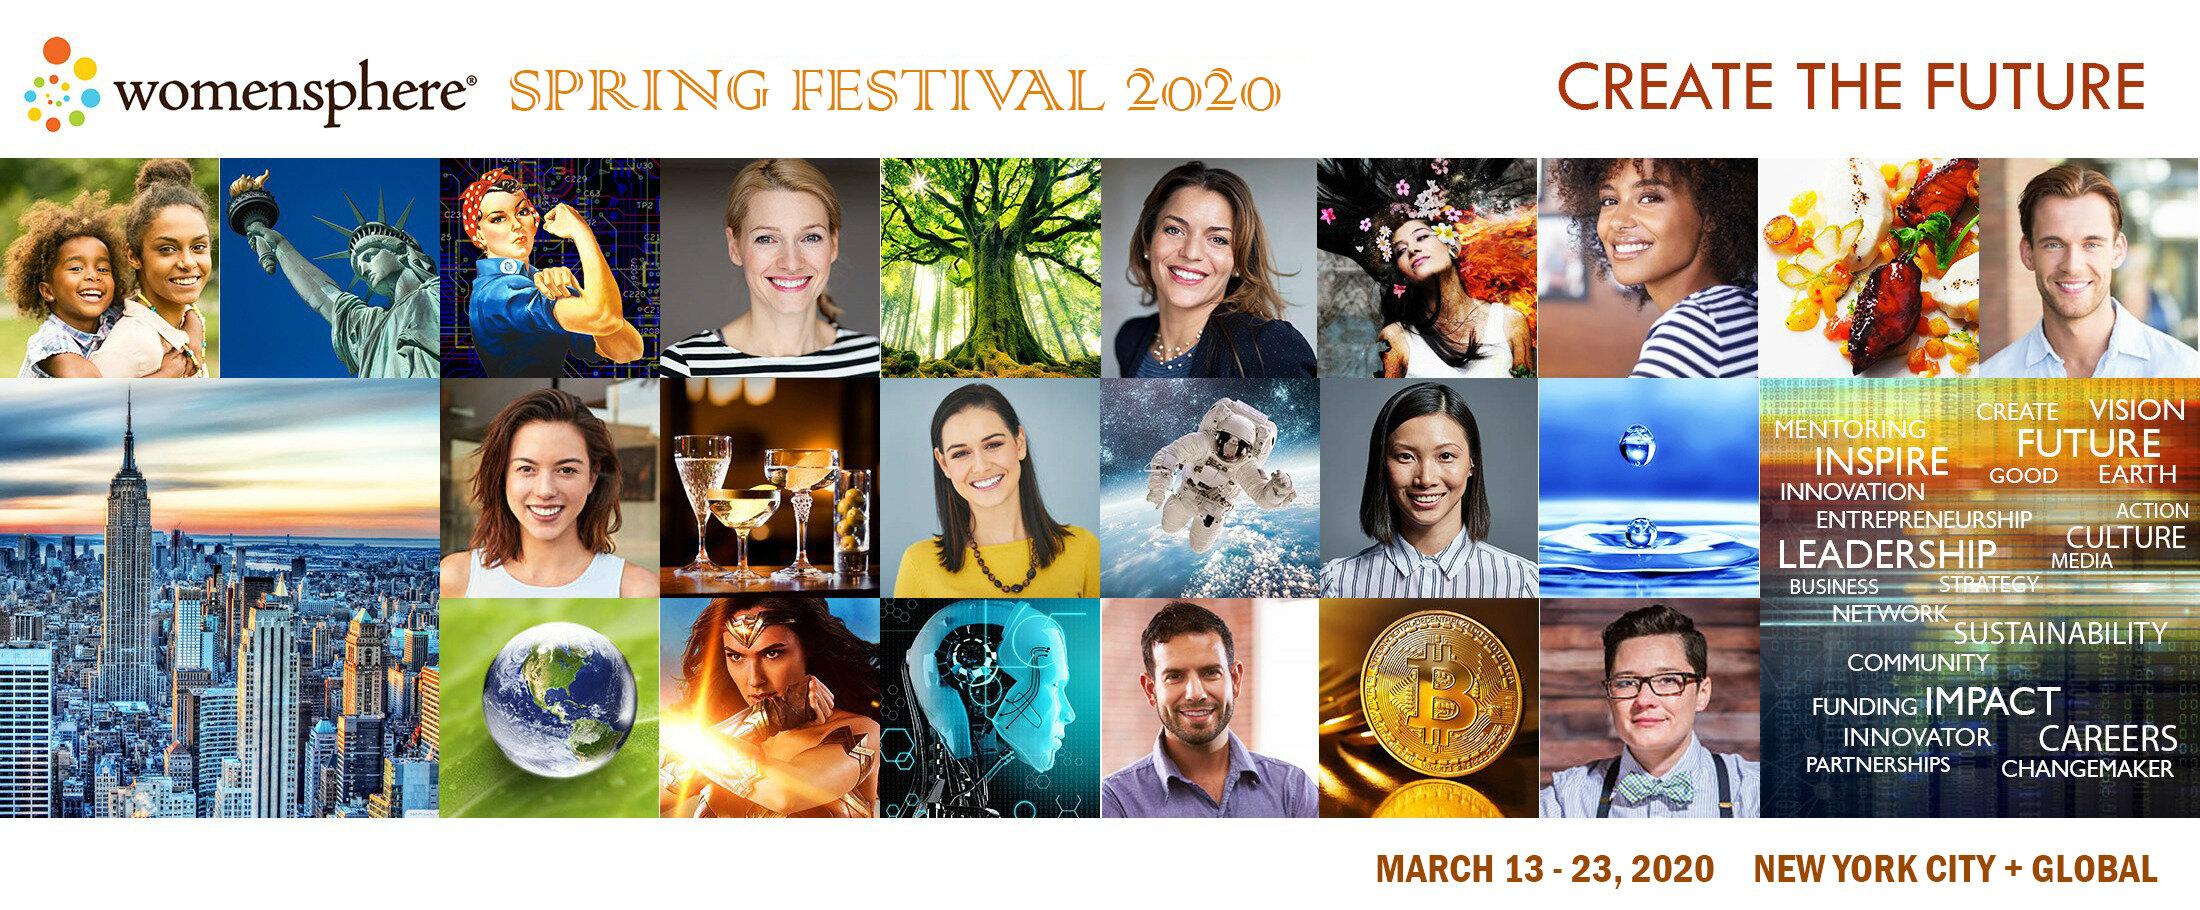 Womensphere Spring Festival March 2020.jpg